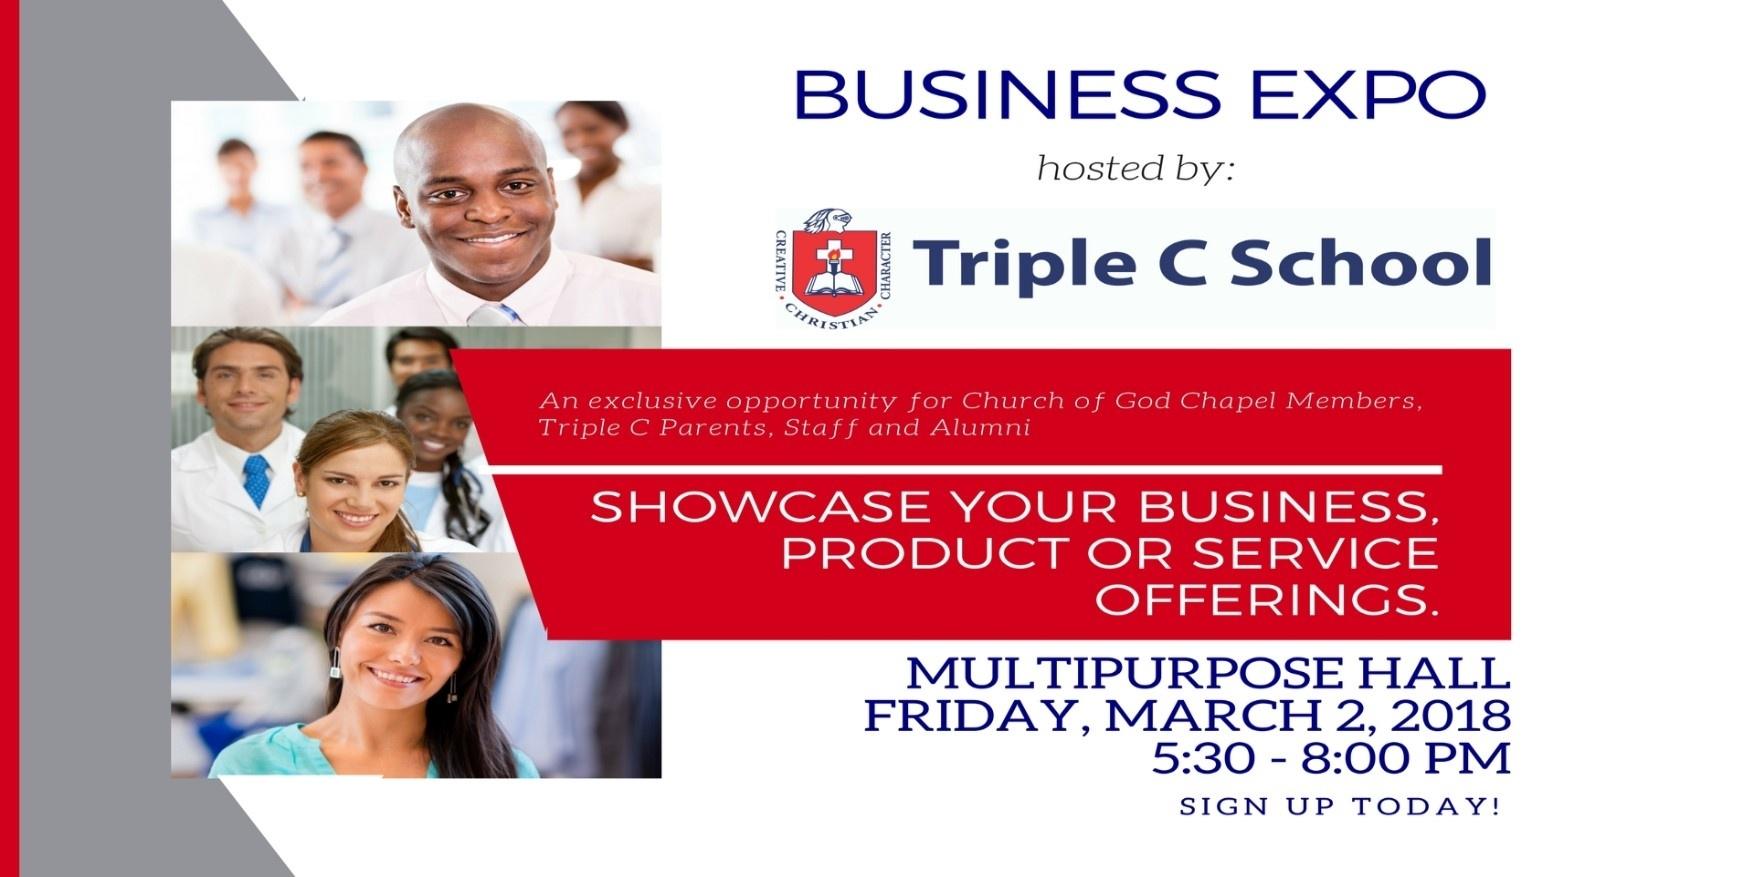 Mark Your Calendar - Business Expo 2018! - Triple C School_Triple C School Calendar